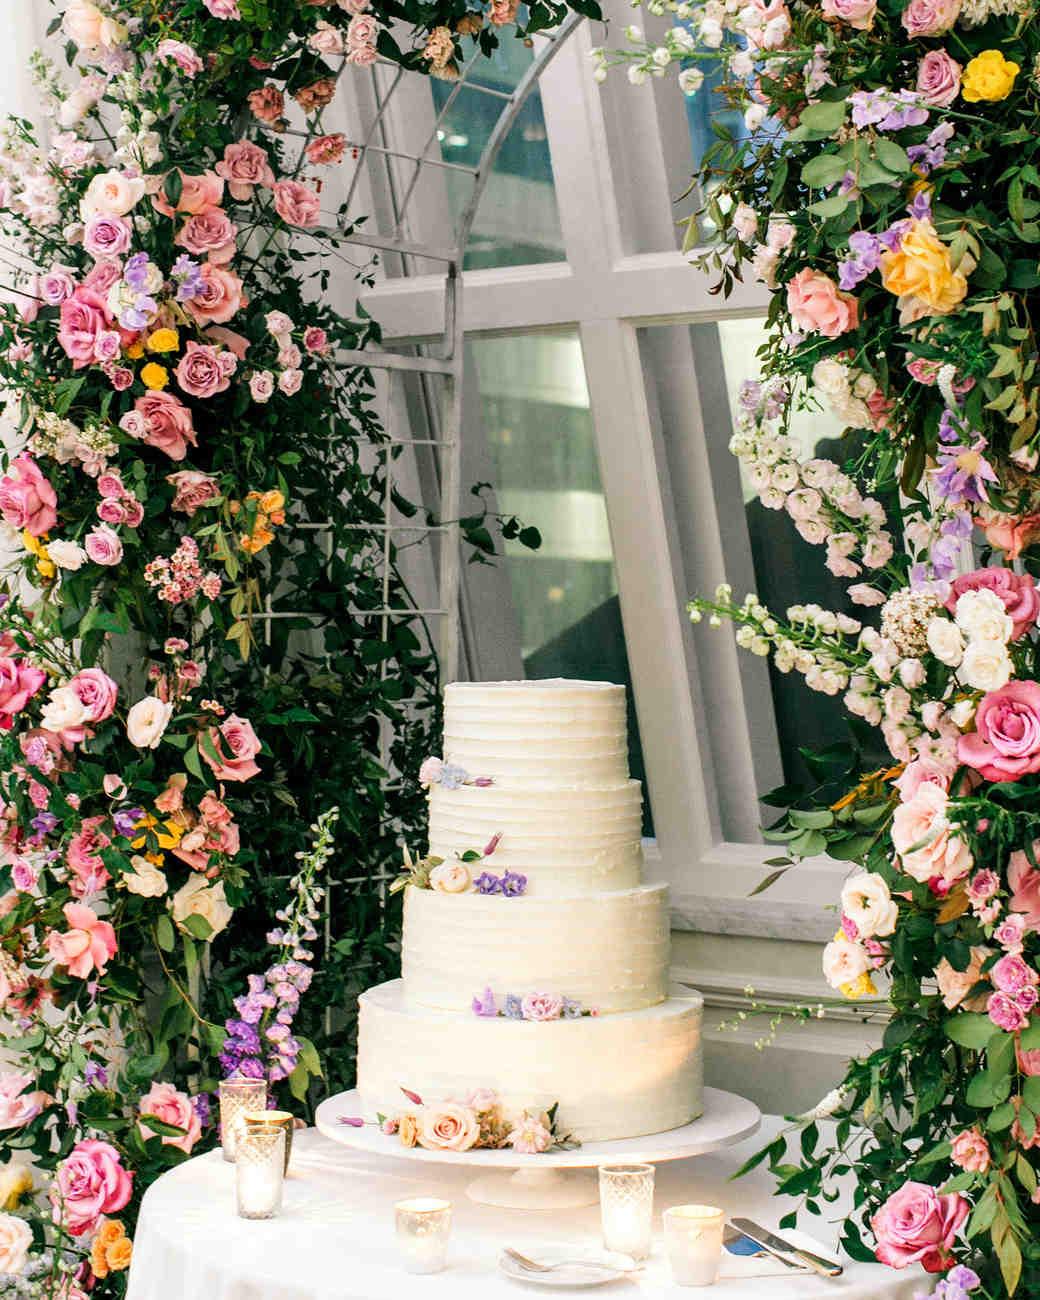 stephanie joe wedding cake and floral arch